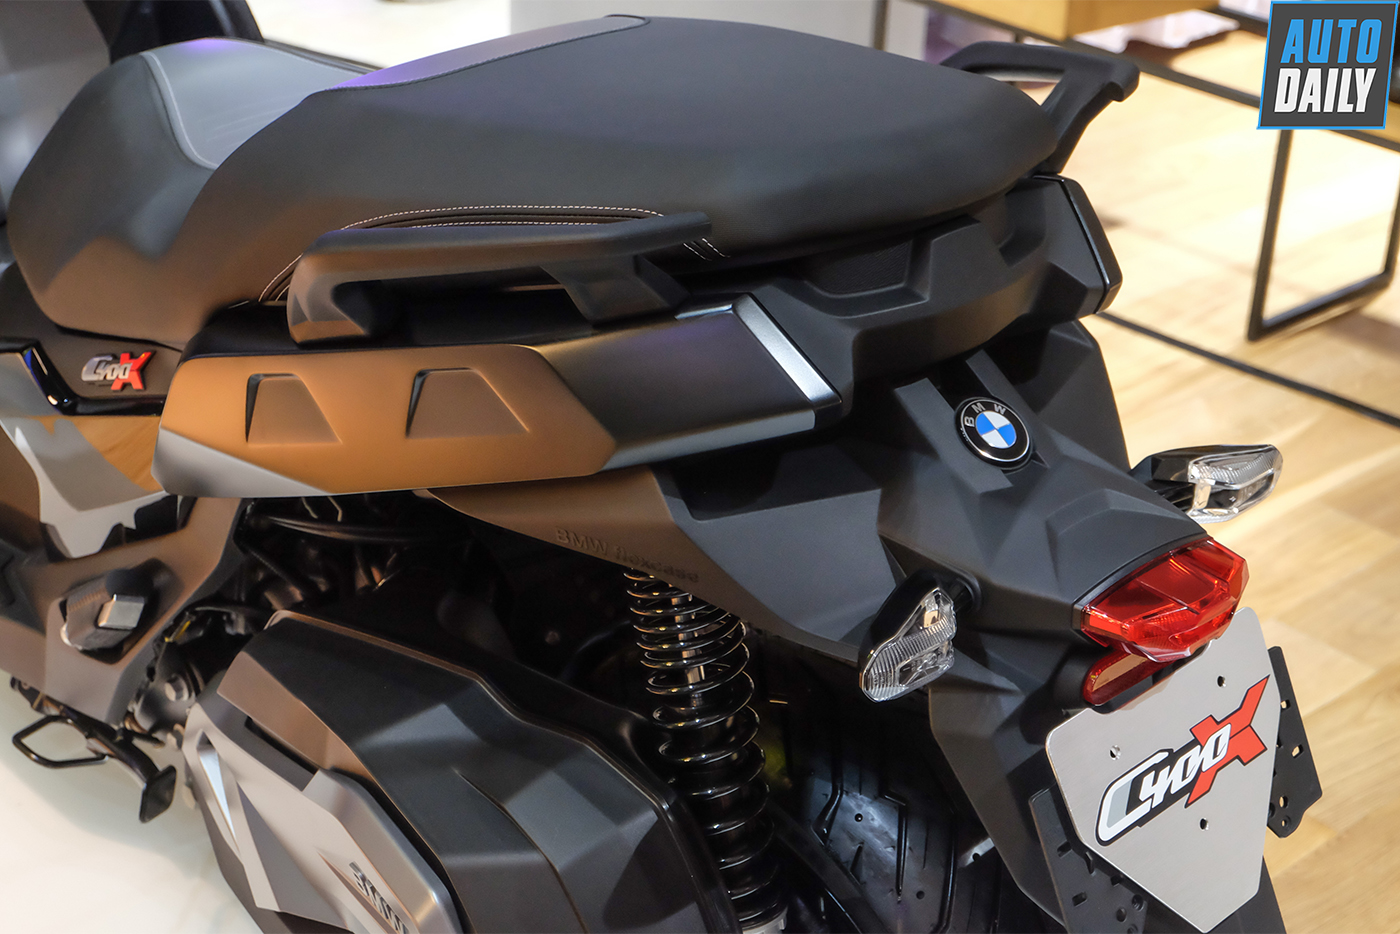 bmw-motorrad-c400x-25.jpg